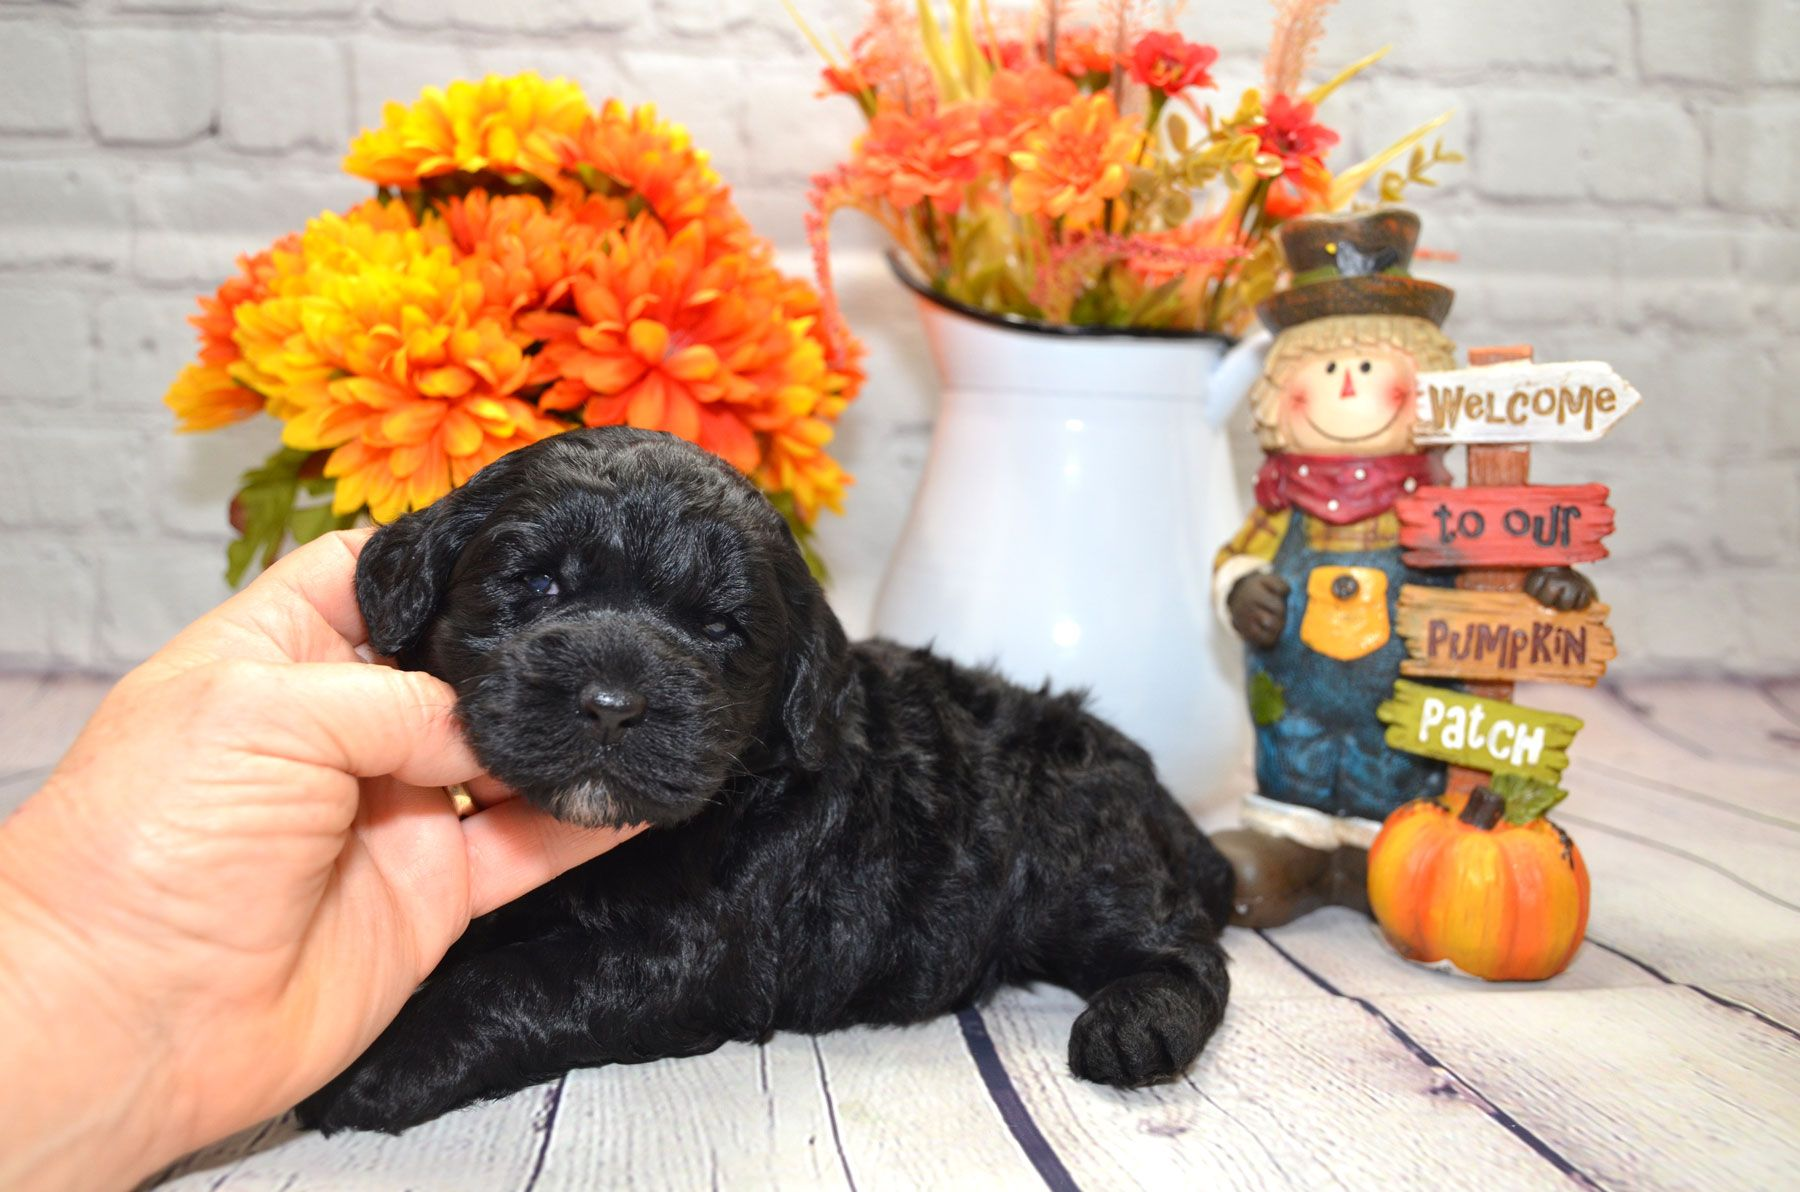 puppies-9-28-20_6643